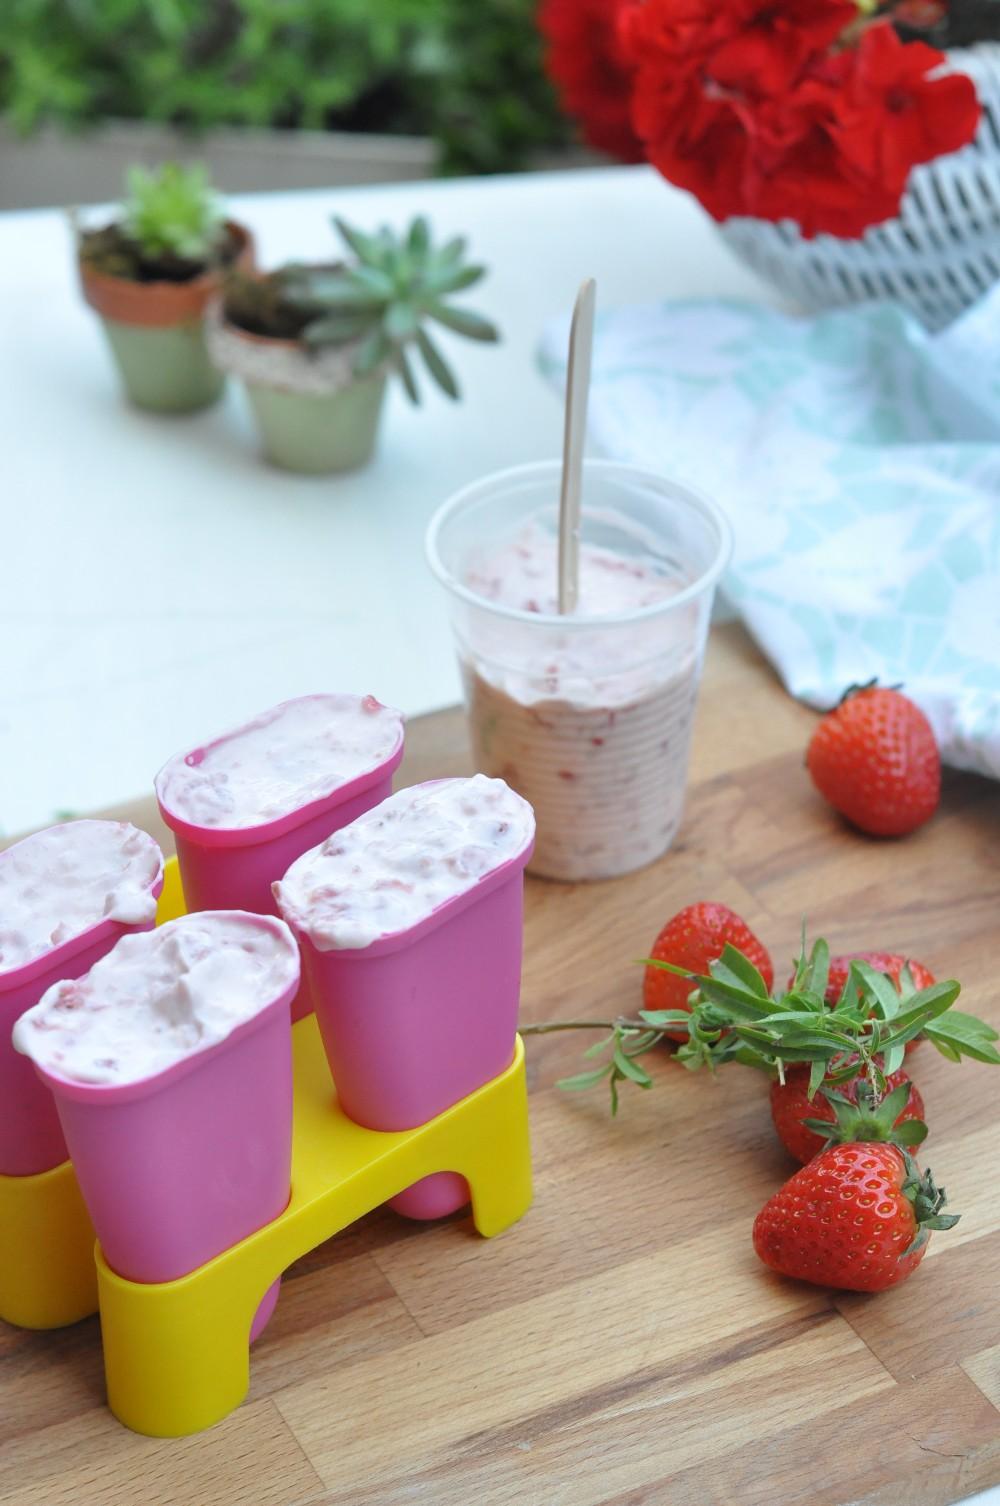 Ghiacciolo alla fragola e yogurt